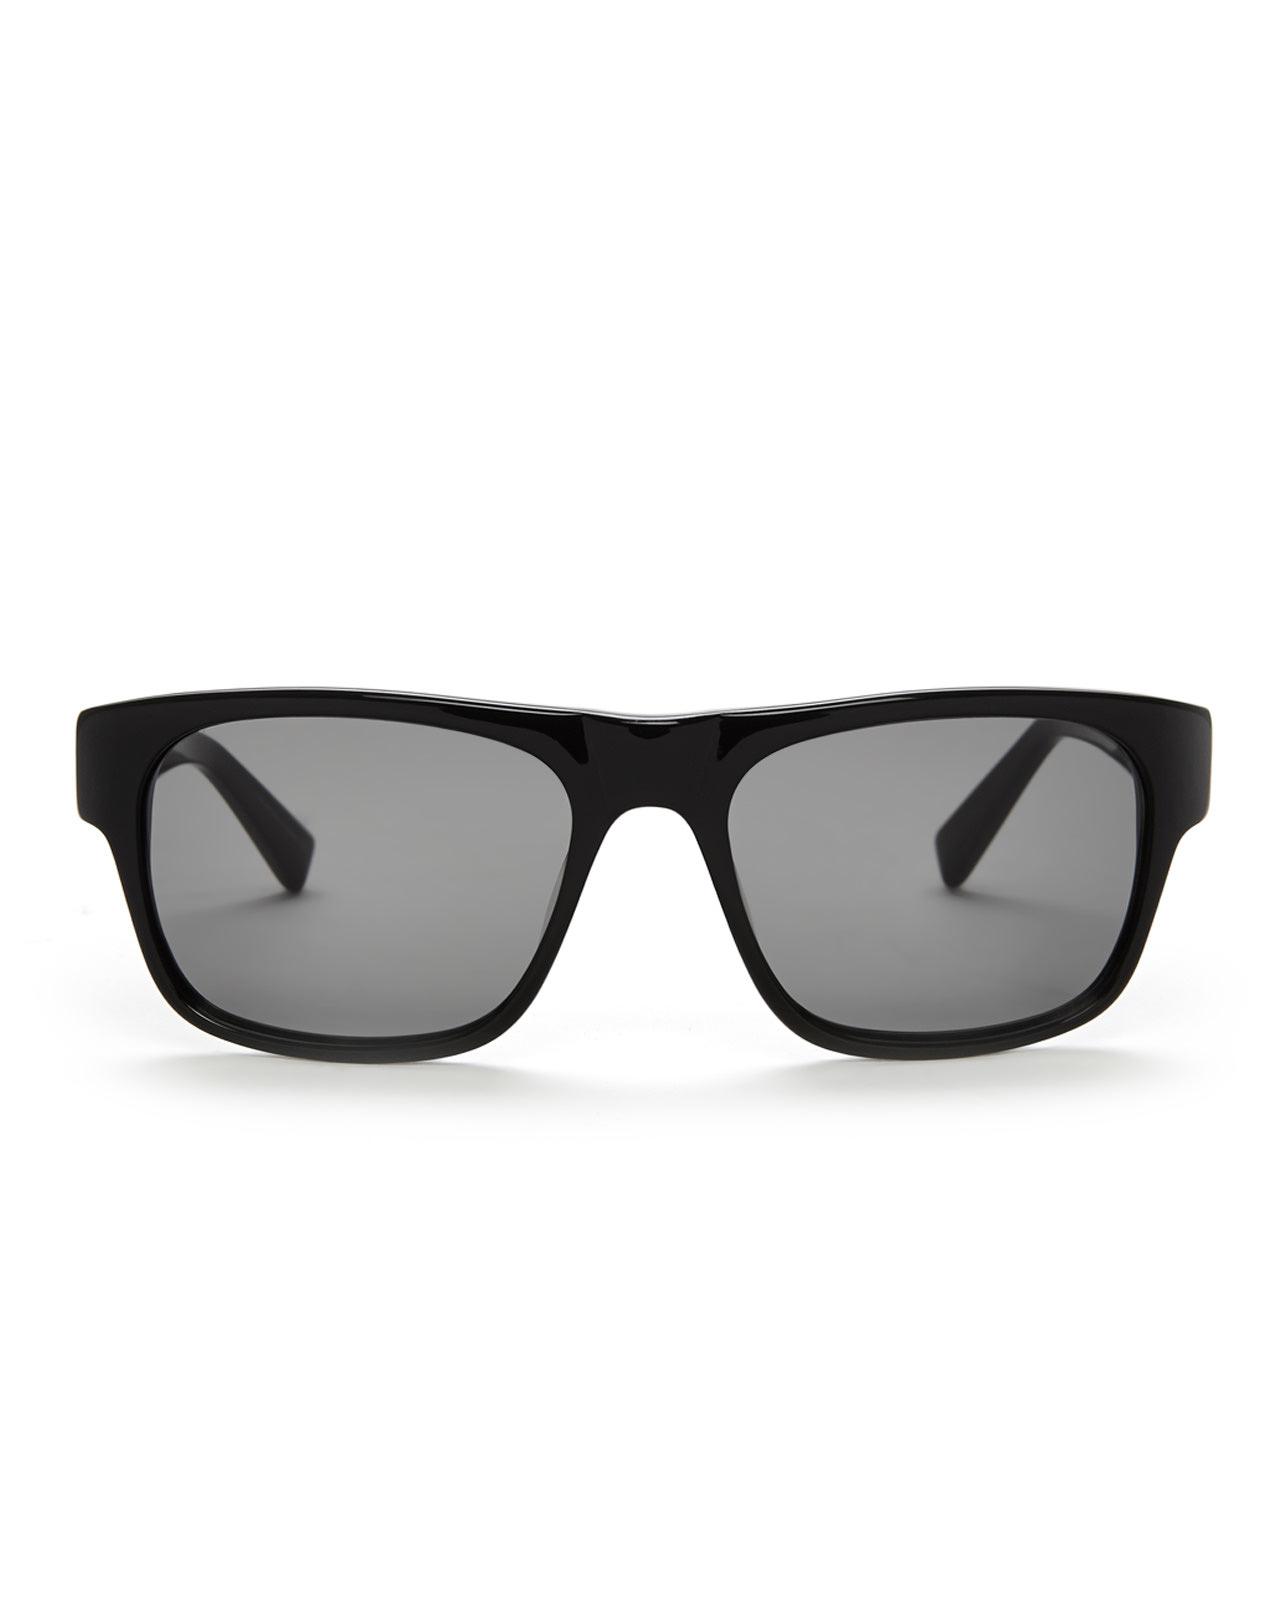 6adfbf0359 Lyst - David Yurman Black Square Wayfarer Sunglasses in Black